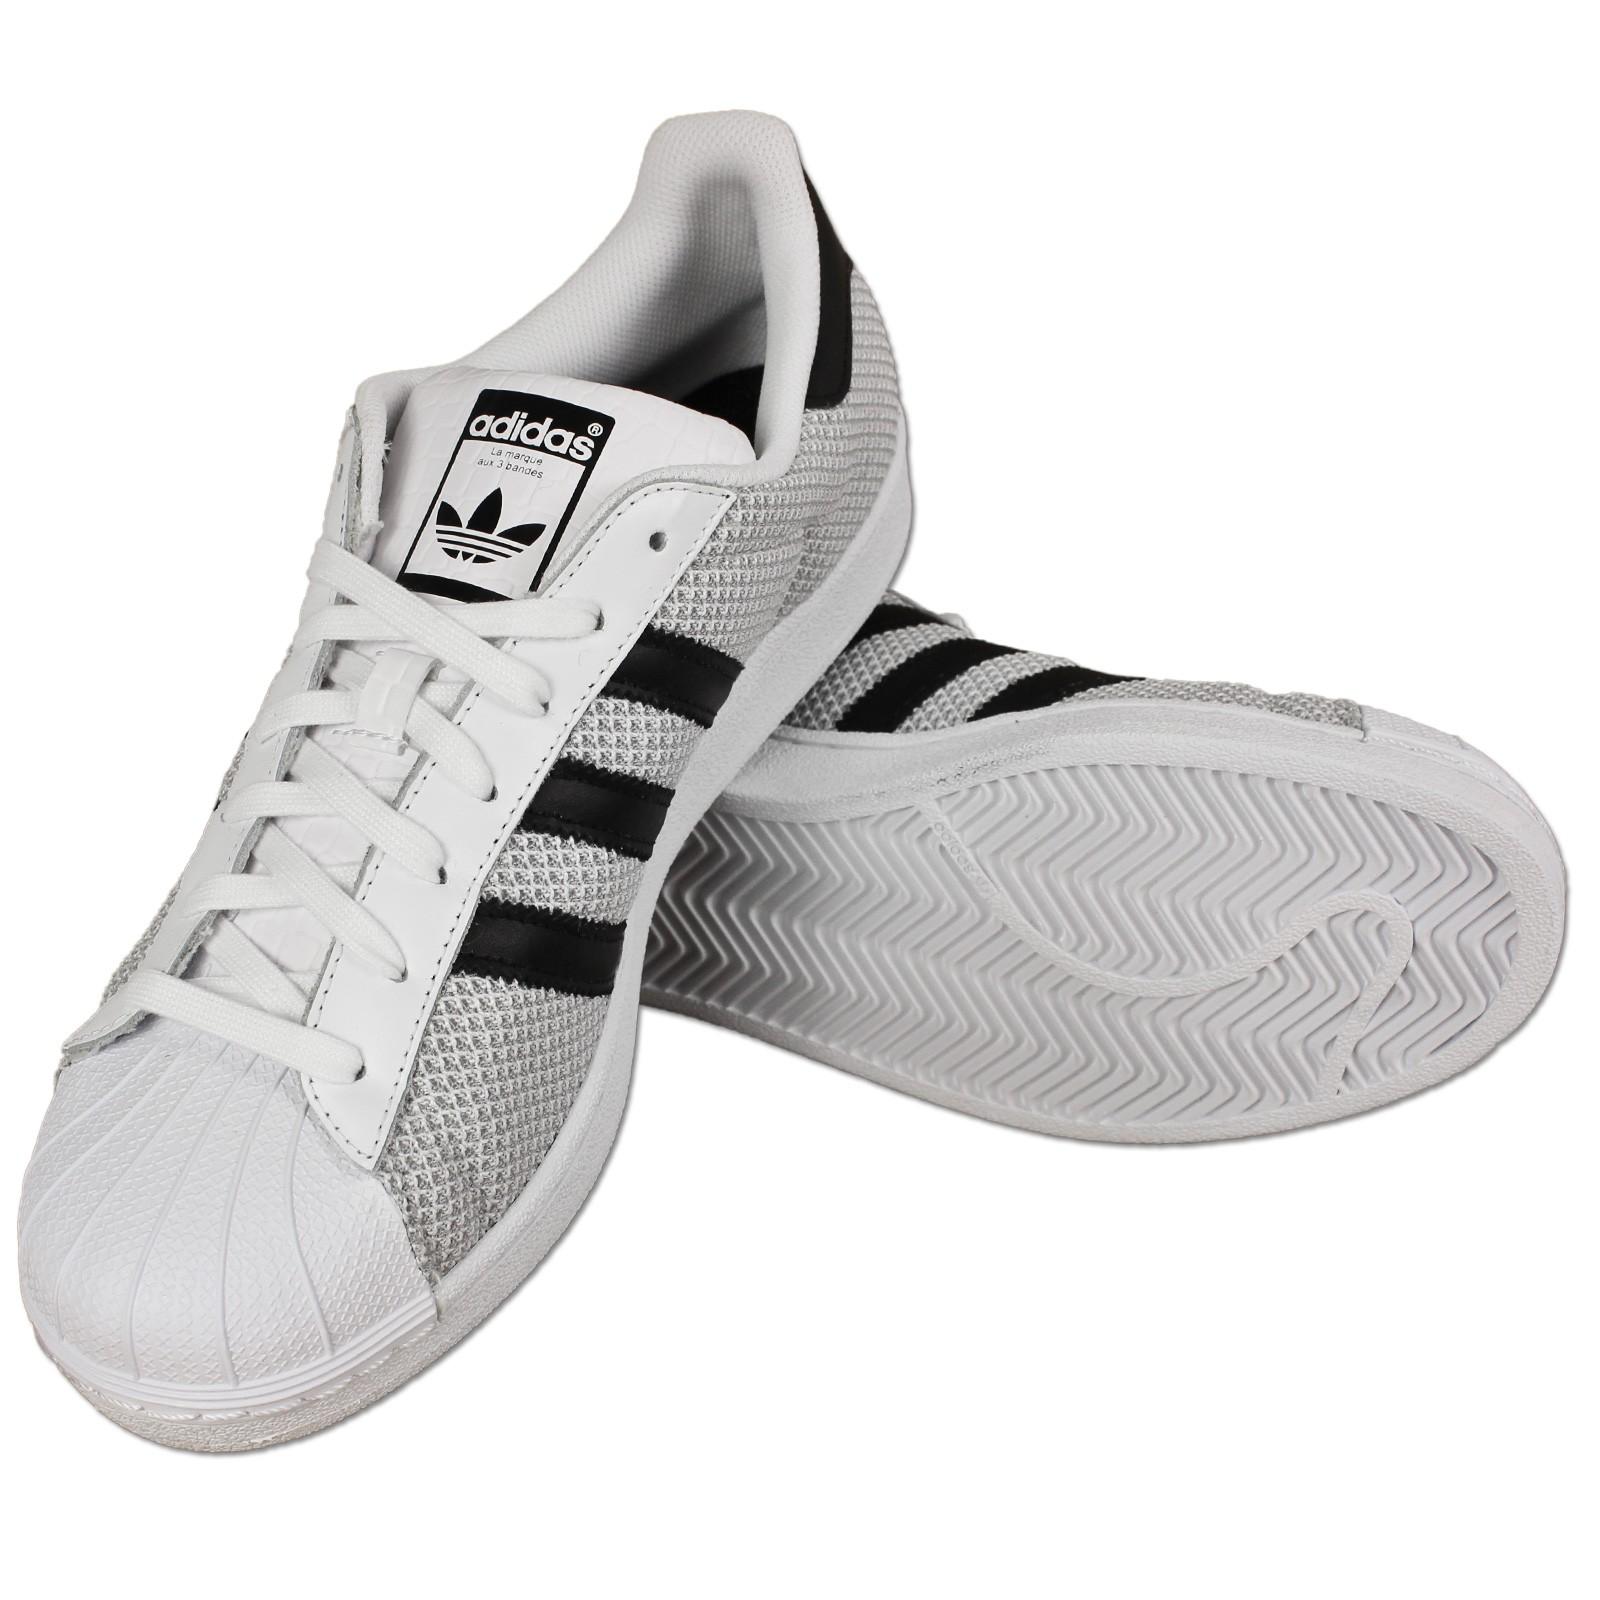 adidas originals cult shoes 80er club comfortable trainers. Black Bedroom Furniture Sets. Home Design Ideas